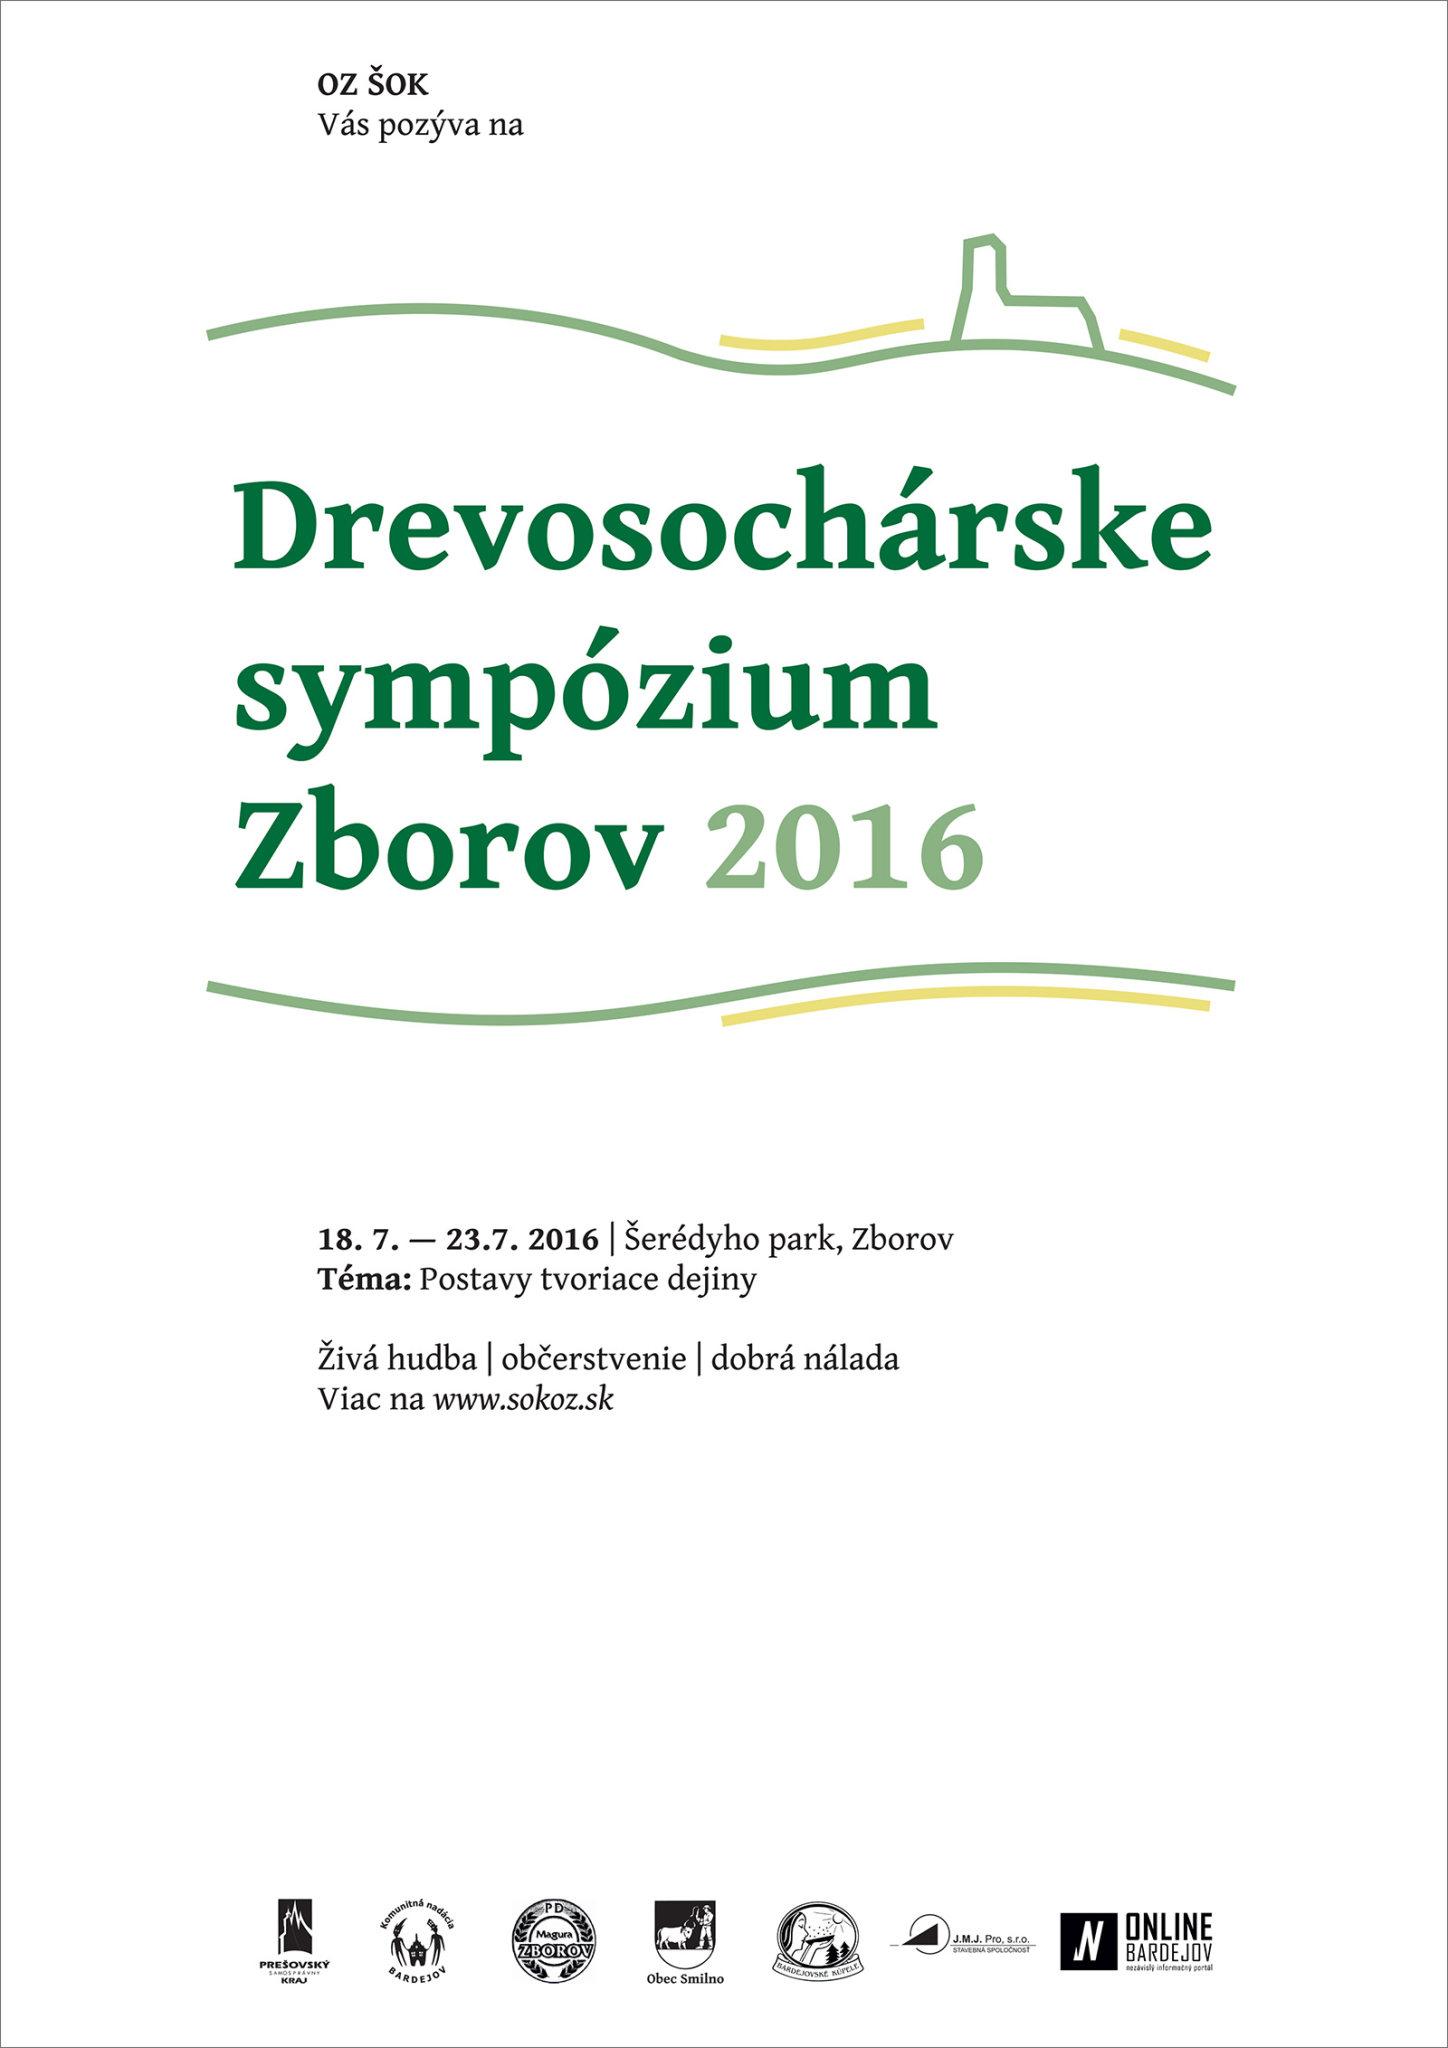 Drevosochárske-sympózium-Zborov-2016---plagát-(+ONline-Bardejov)